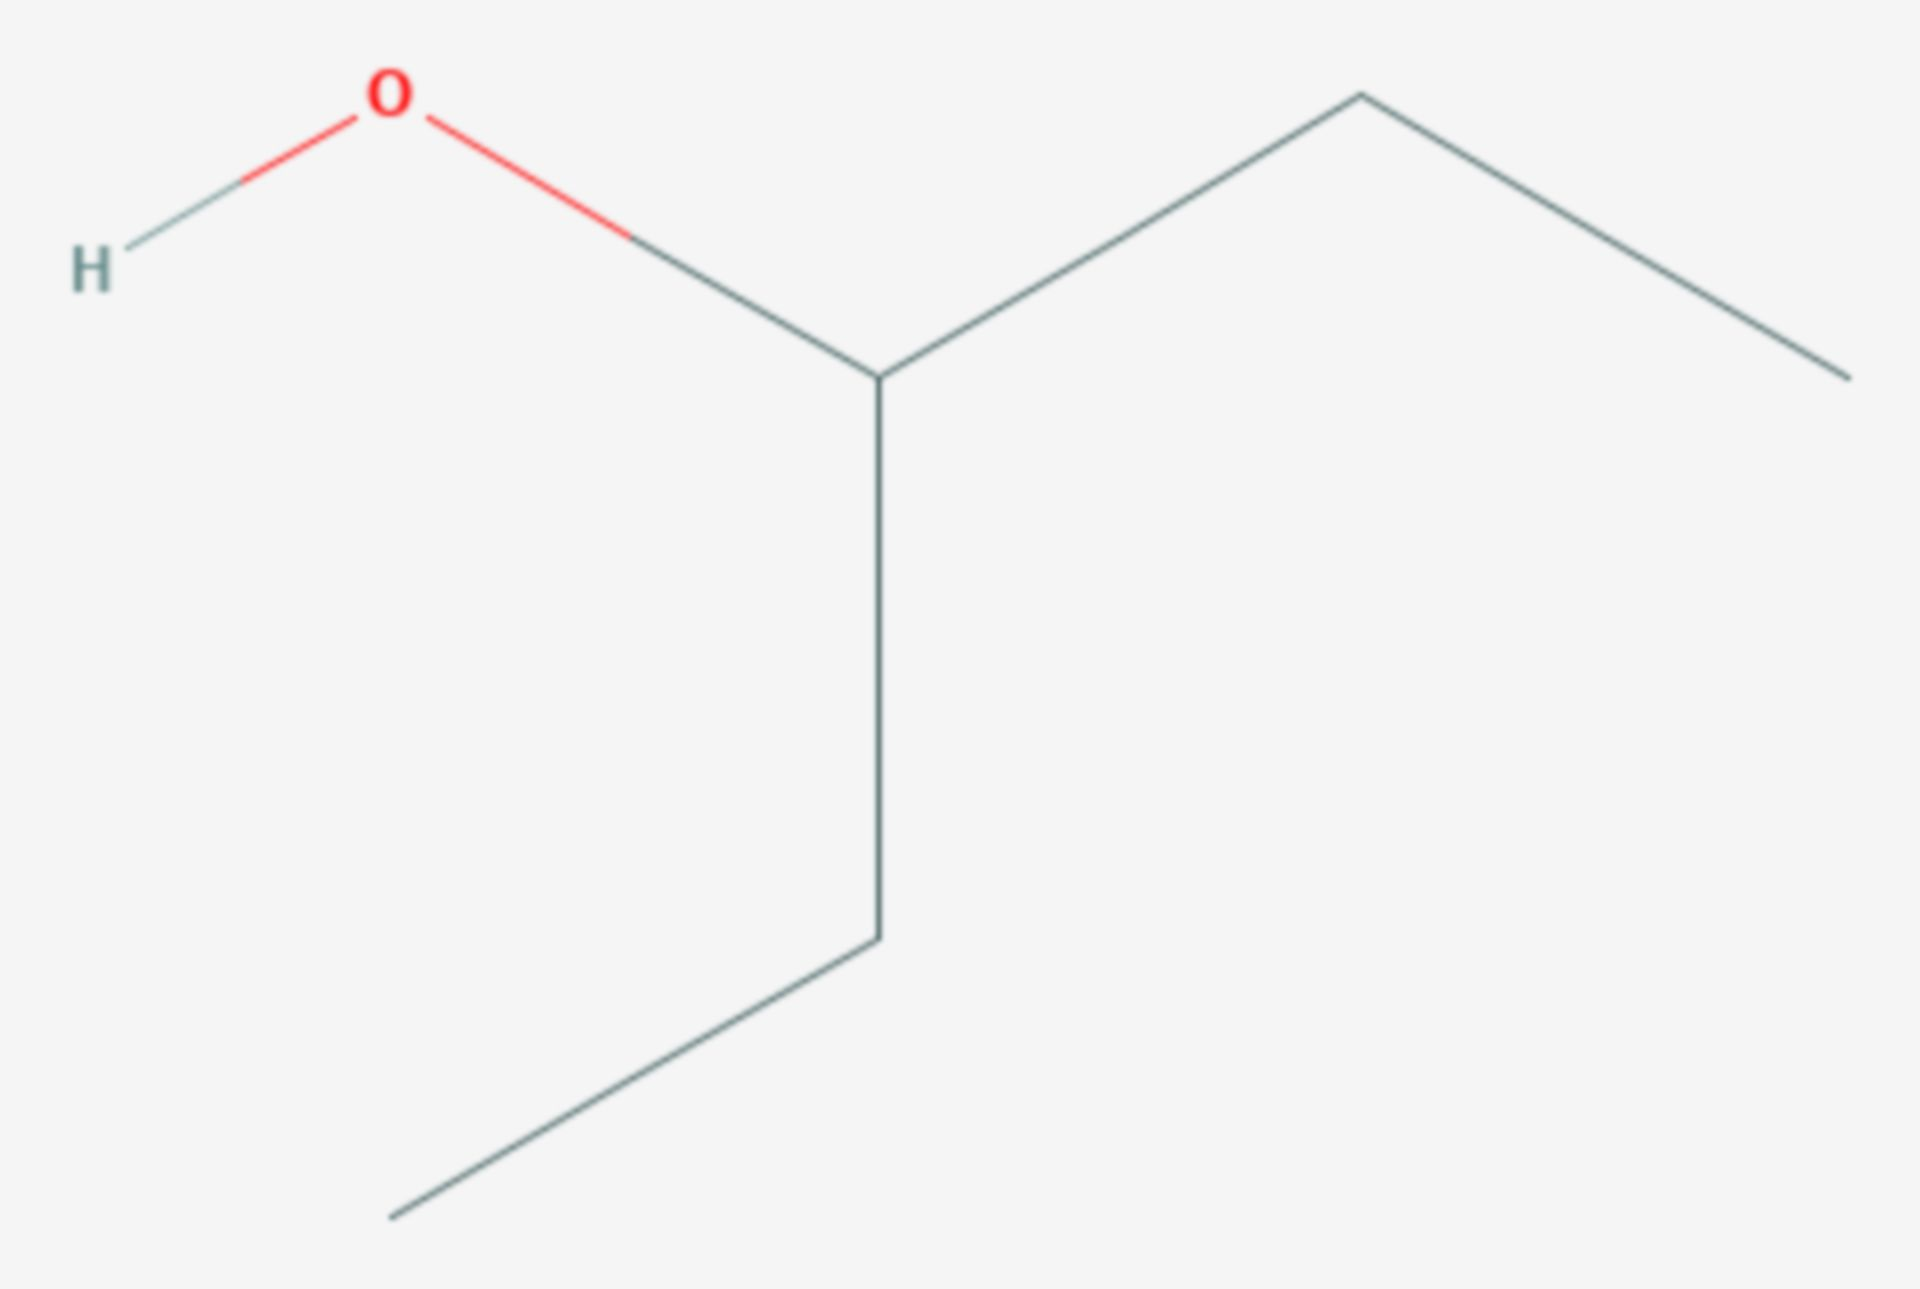 3-Pentanol (Strukturformel)